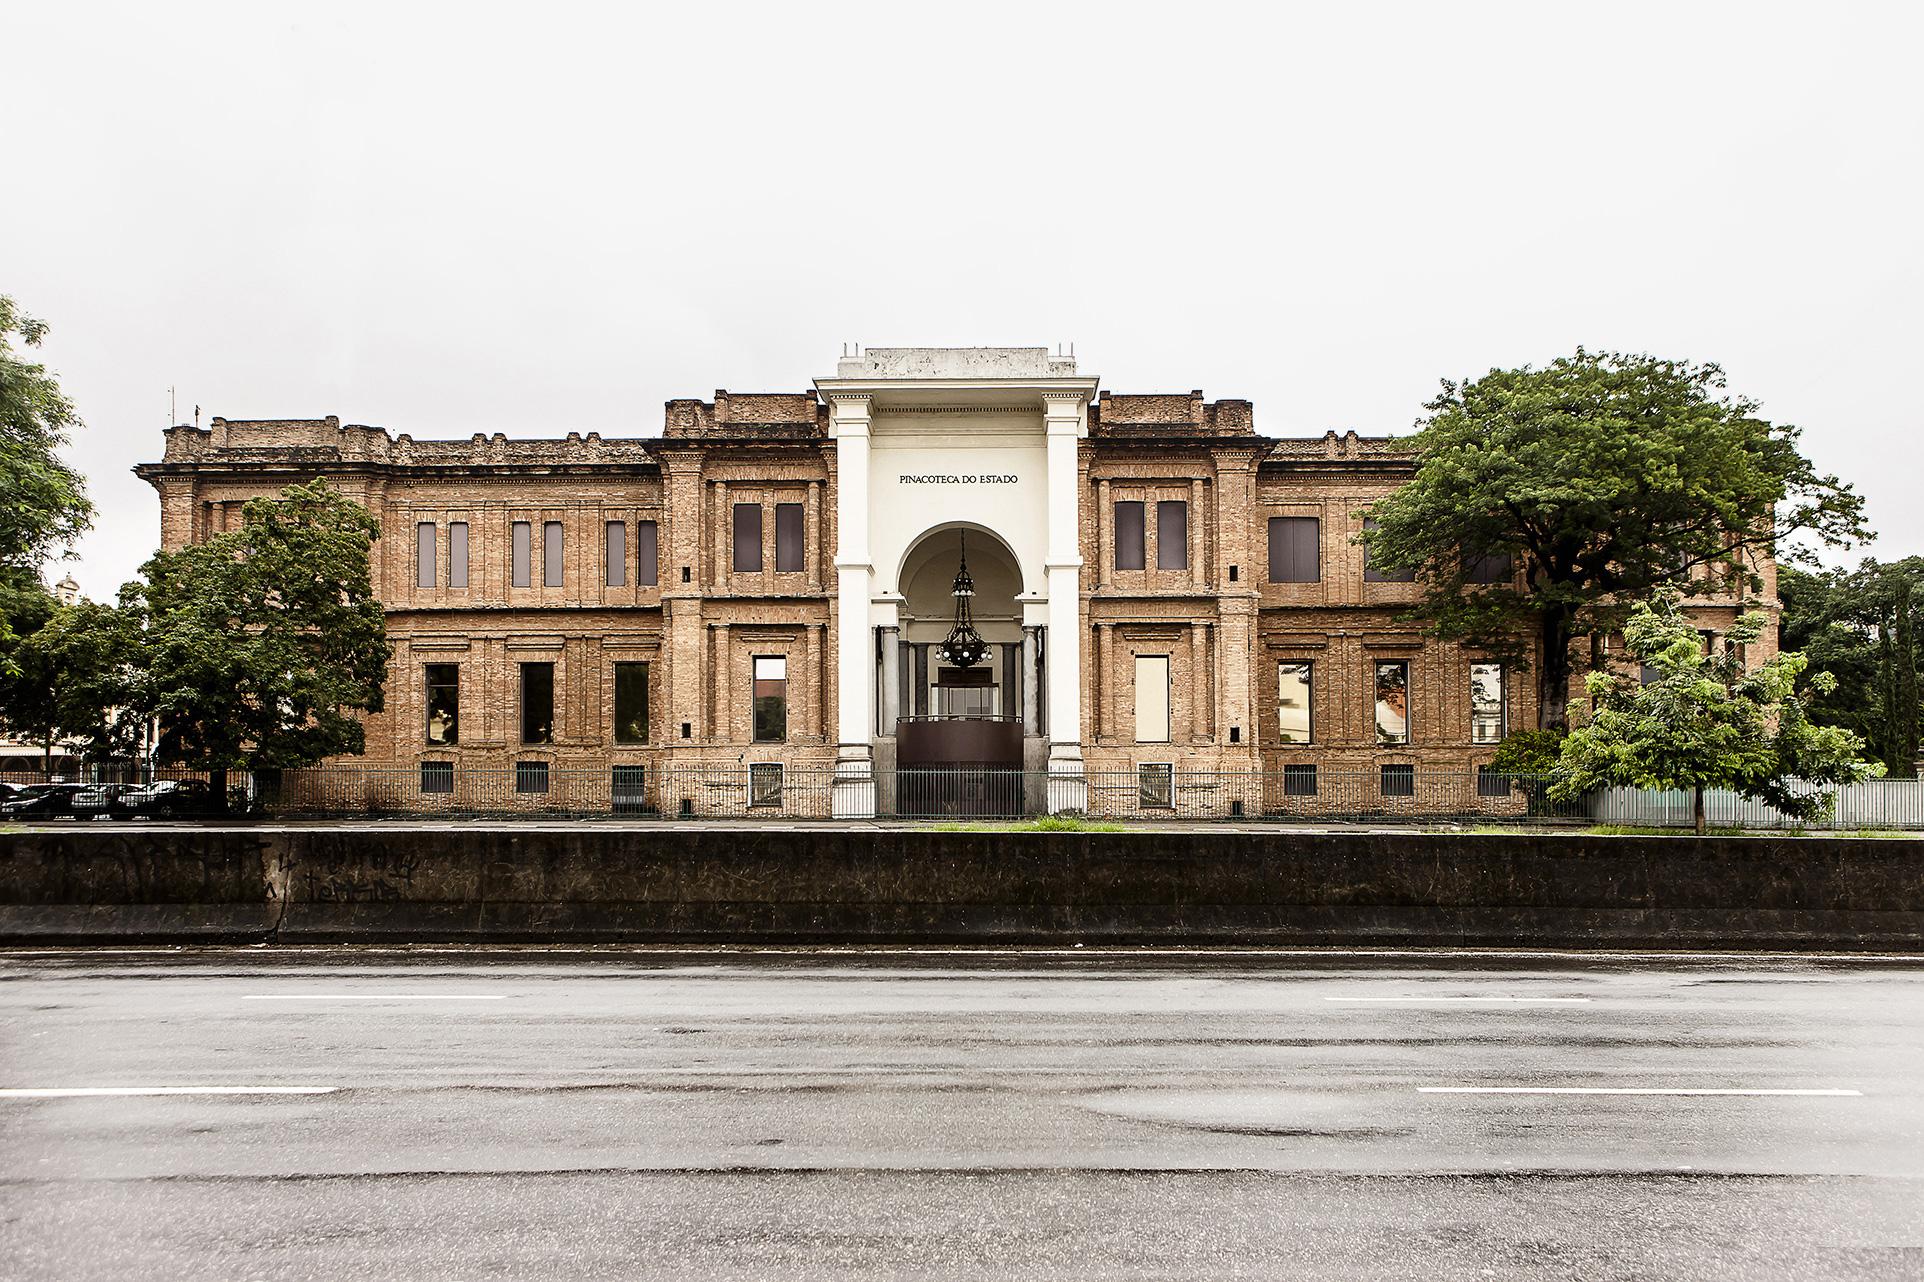 Pina-fachada-1924